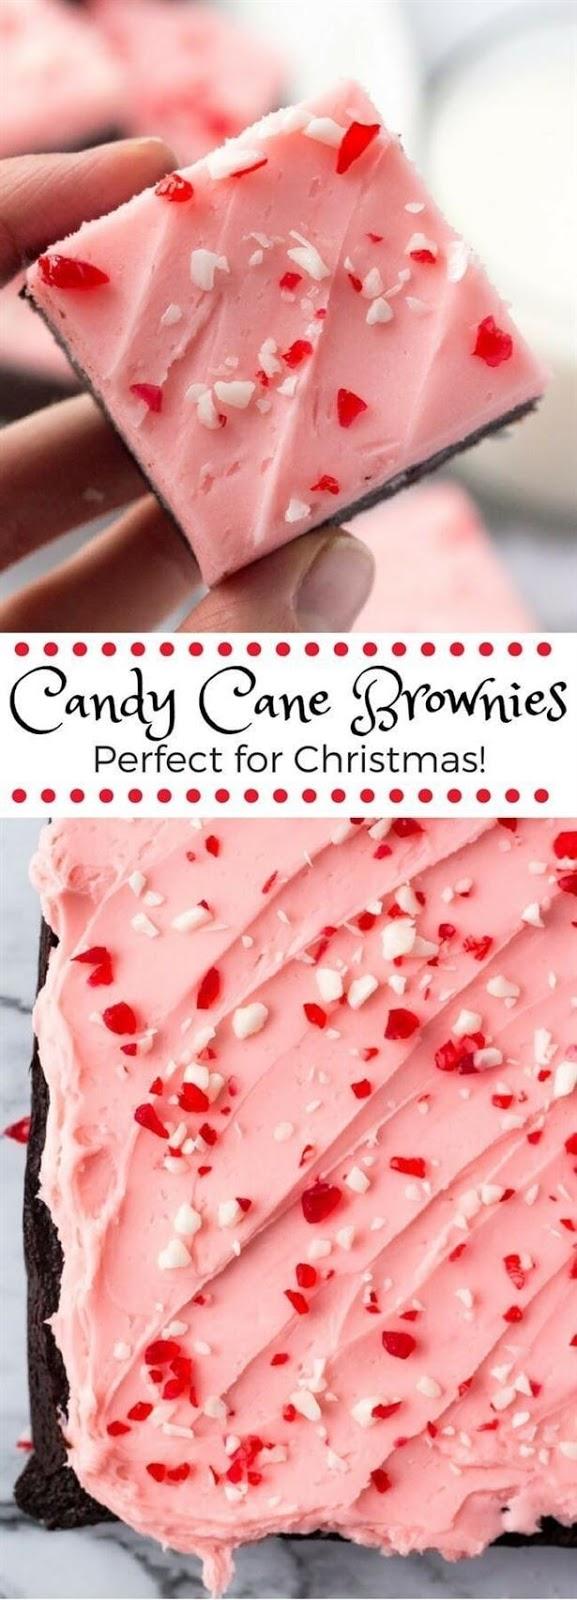 Candy Cane Brownies #Candycane #candy #Cookies #Bestcandy #Bestcookies #Pinkcookies #Dessert #italiandessert #Americandessert #Bestdessert